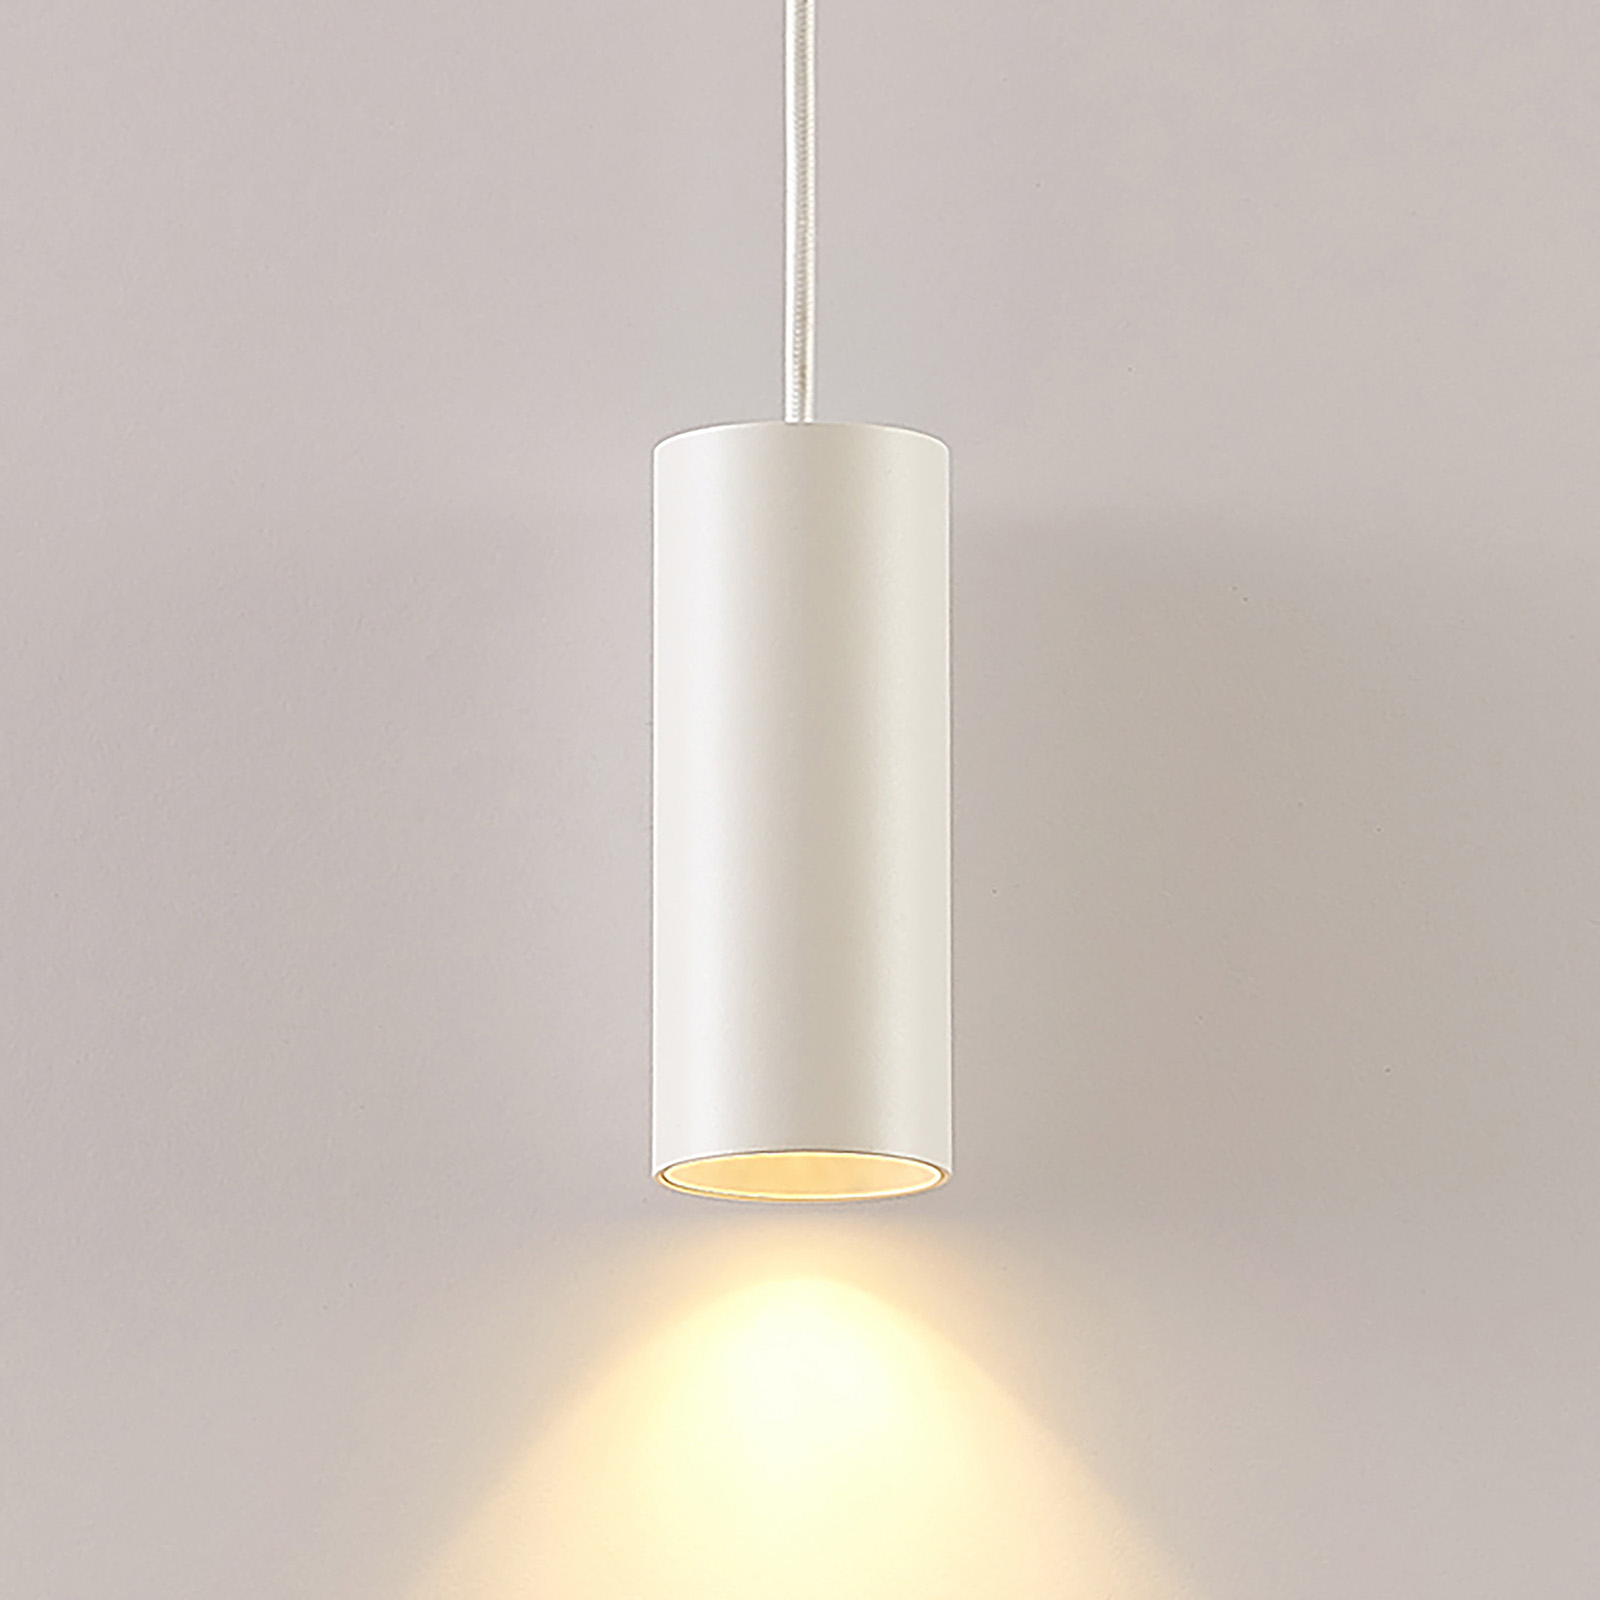 Arcchio Ejona hanglamp, hoogte 15 cm, wit